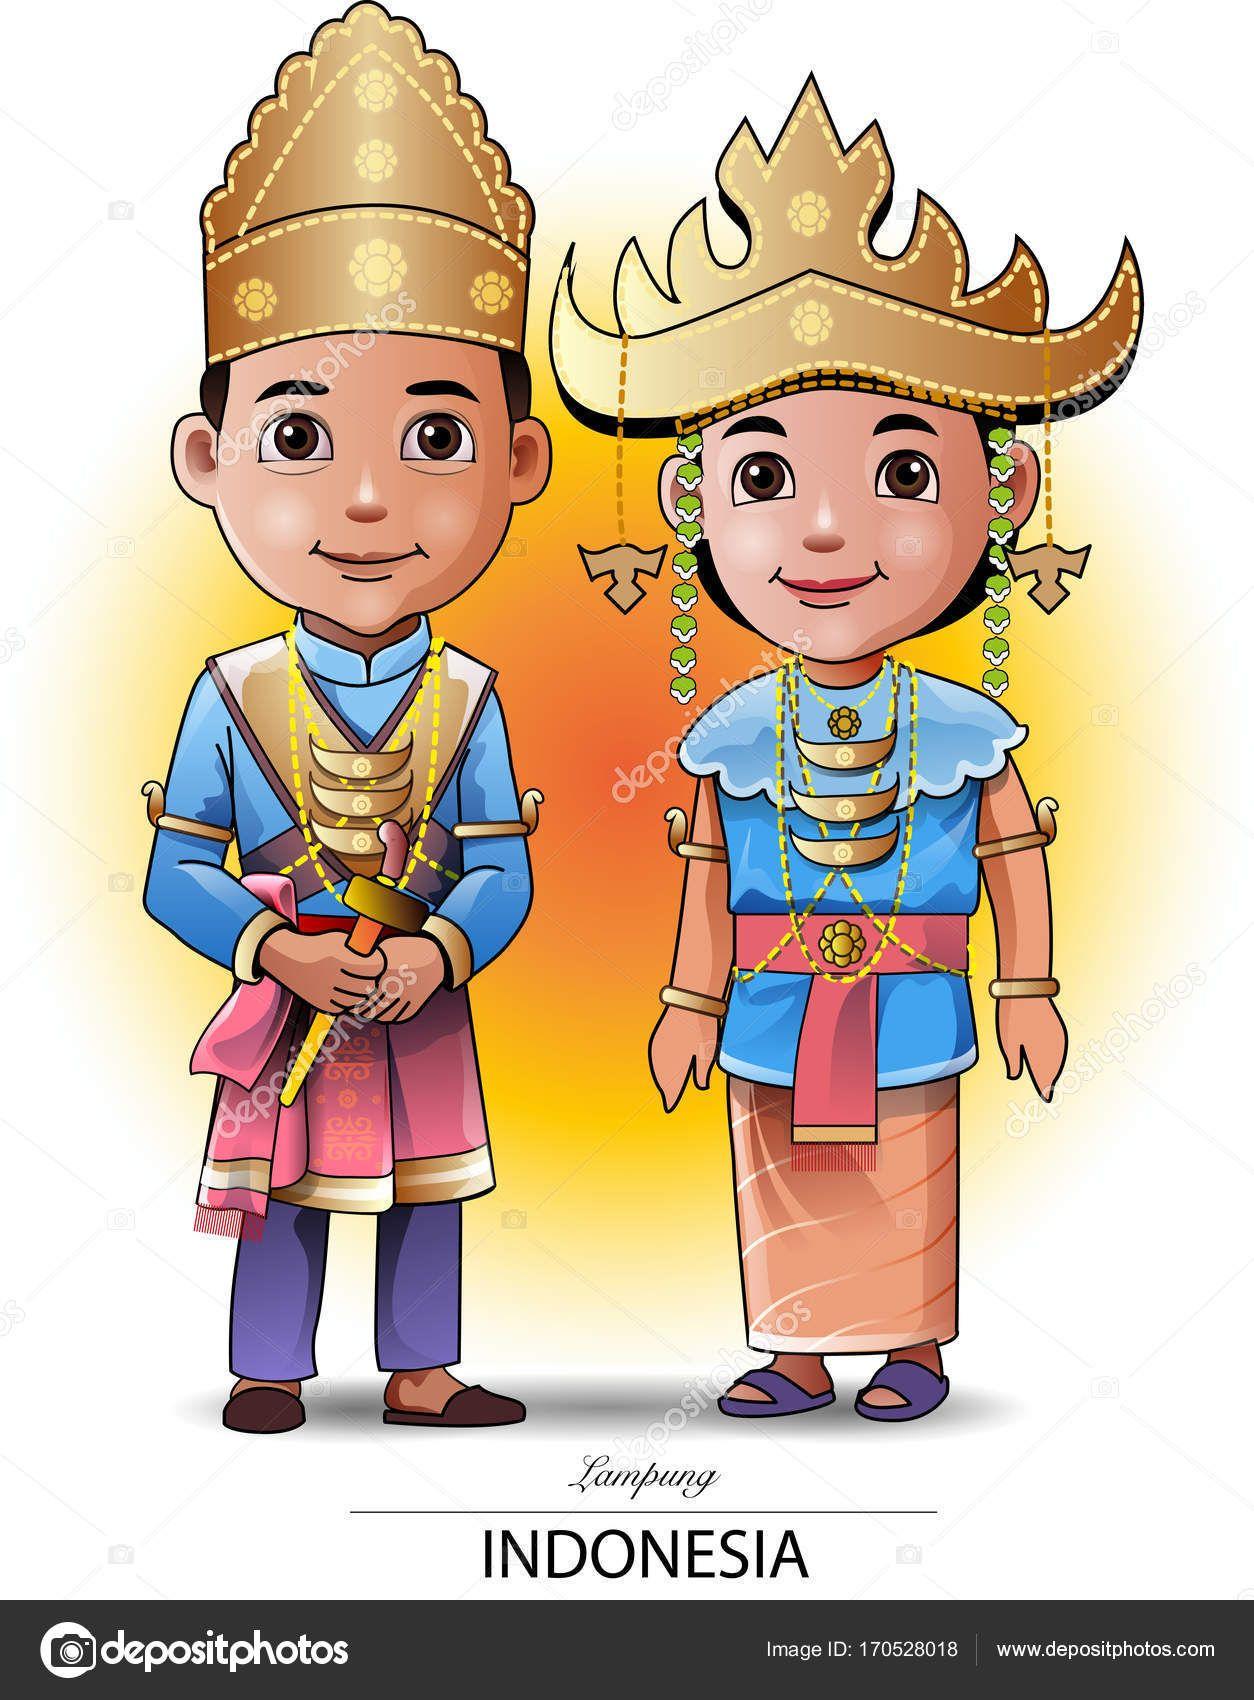 Gambar Pakaian Adat Sulawesi Selatan Kartun